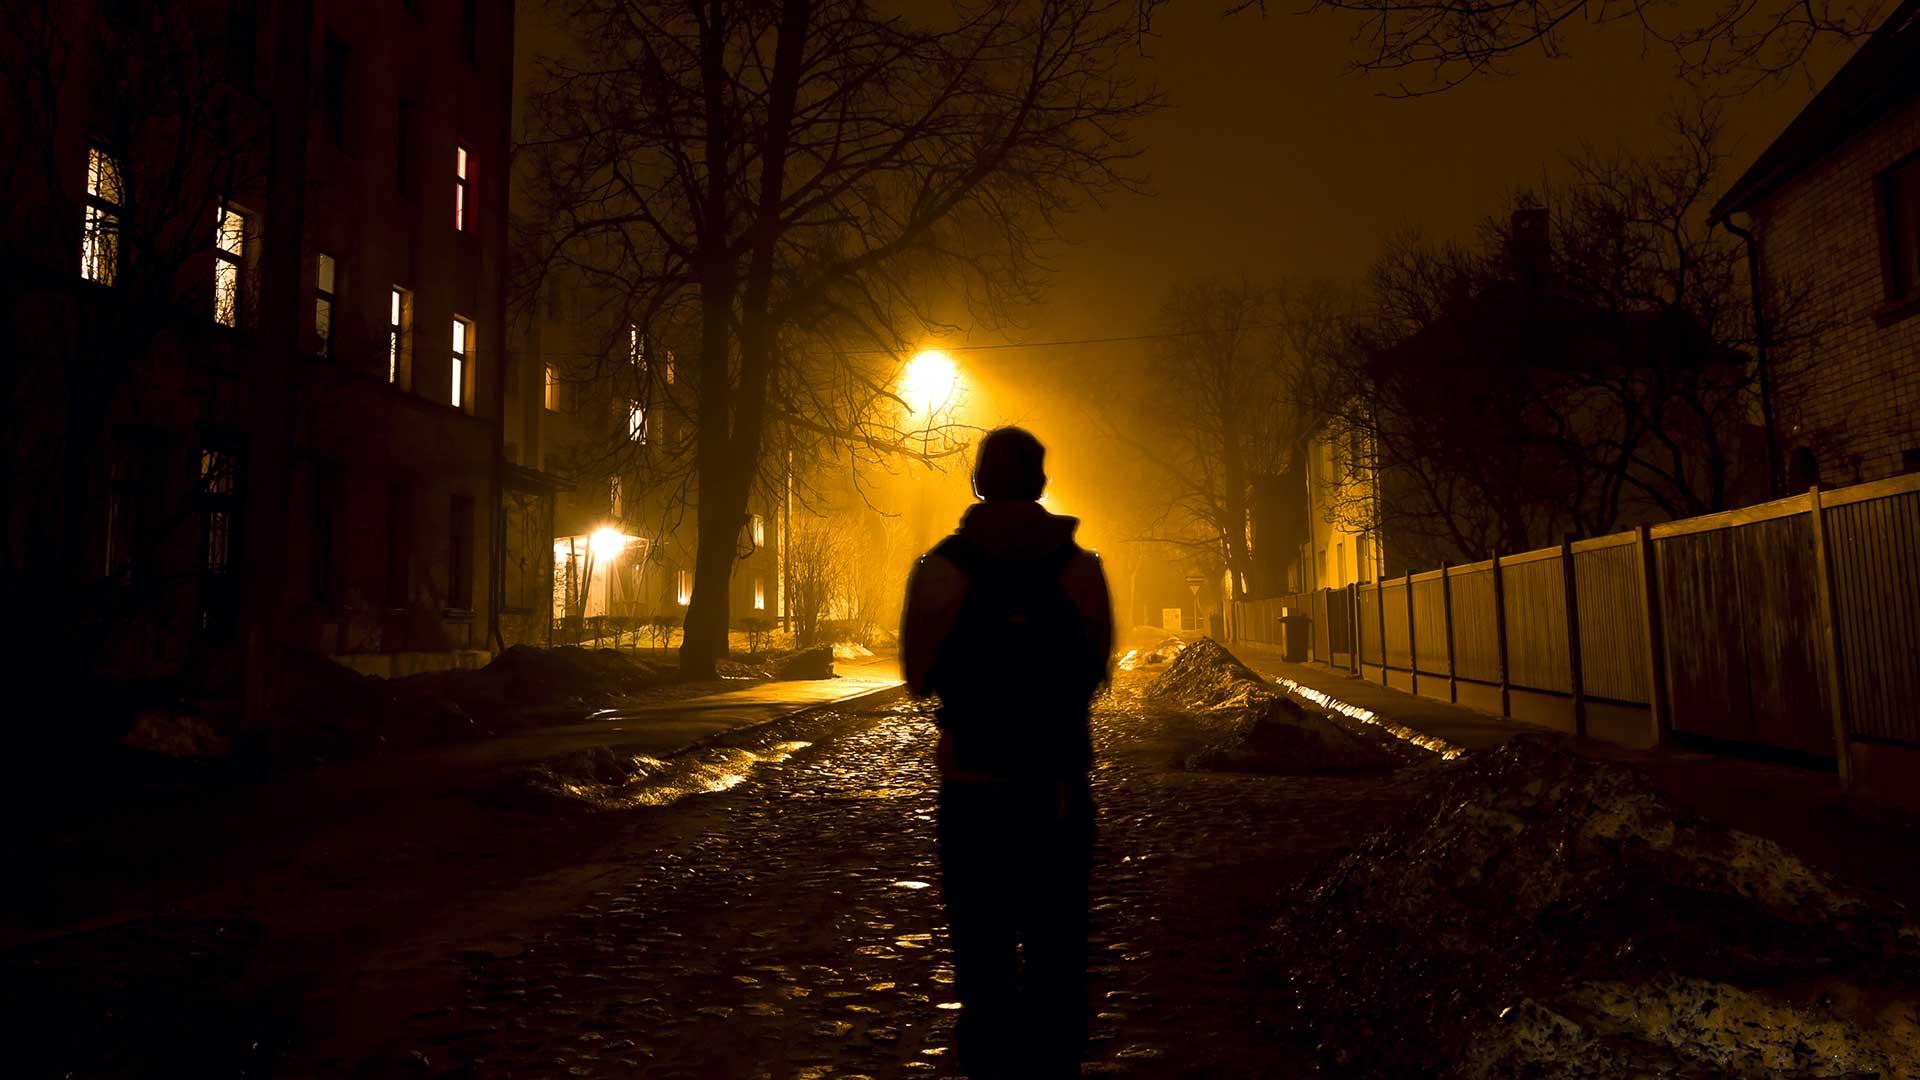 Streetlight-Man-Walking